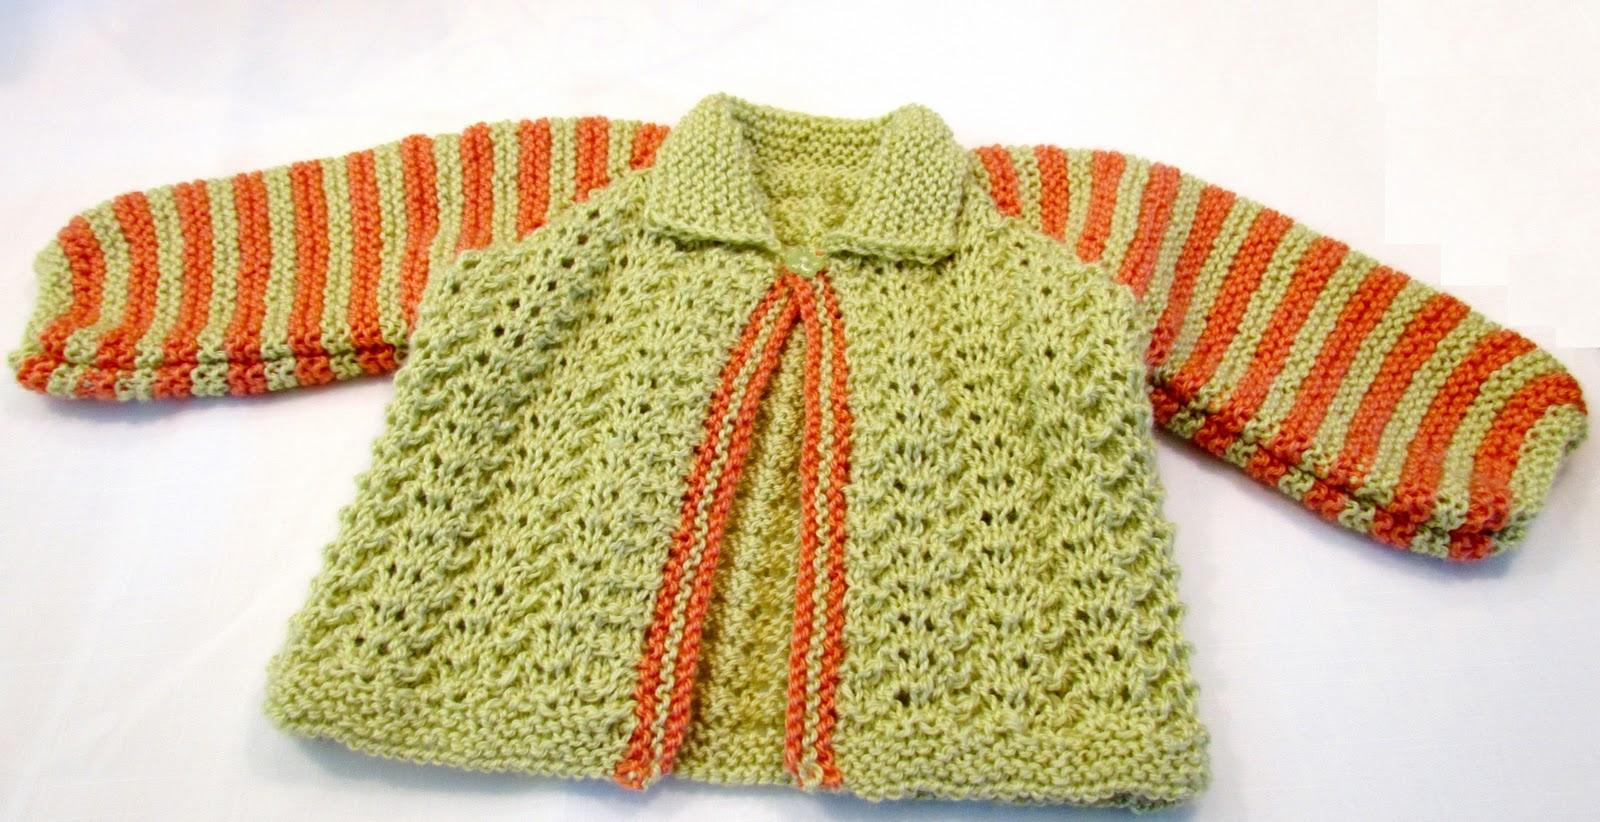 http://1.bp.blogspot.com/_i-FANGtrZCk/TUCx0FxEJvI/AAAAAAAAAQE/mmG3hTkBdw0/s1600/sweater.jpg